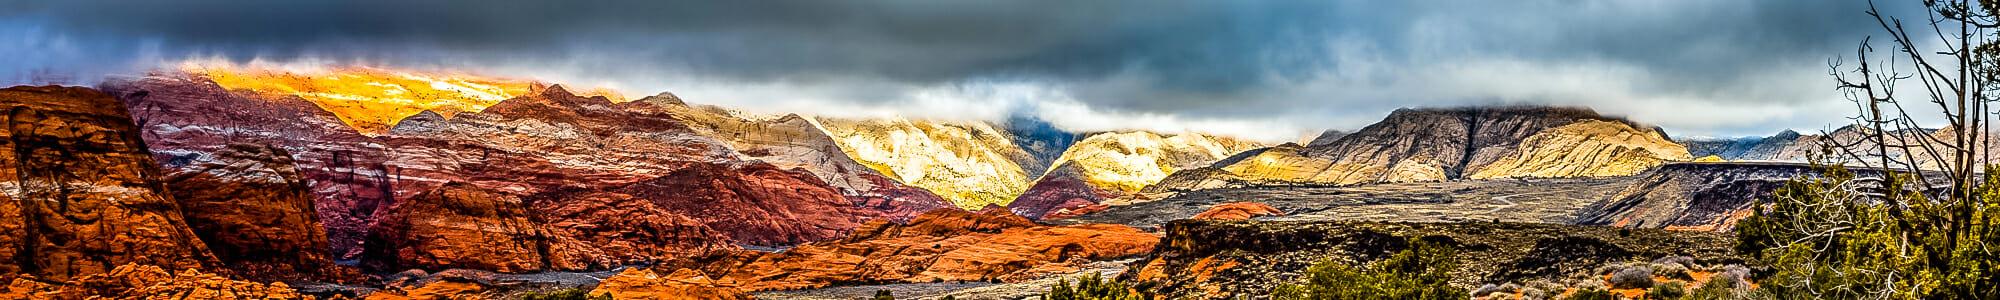 Snow Canyon State Park - St. George, Utah